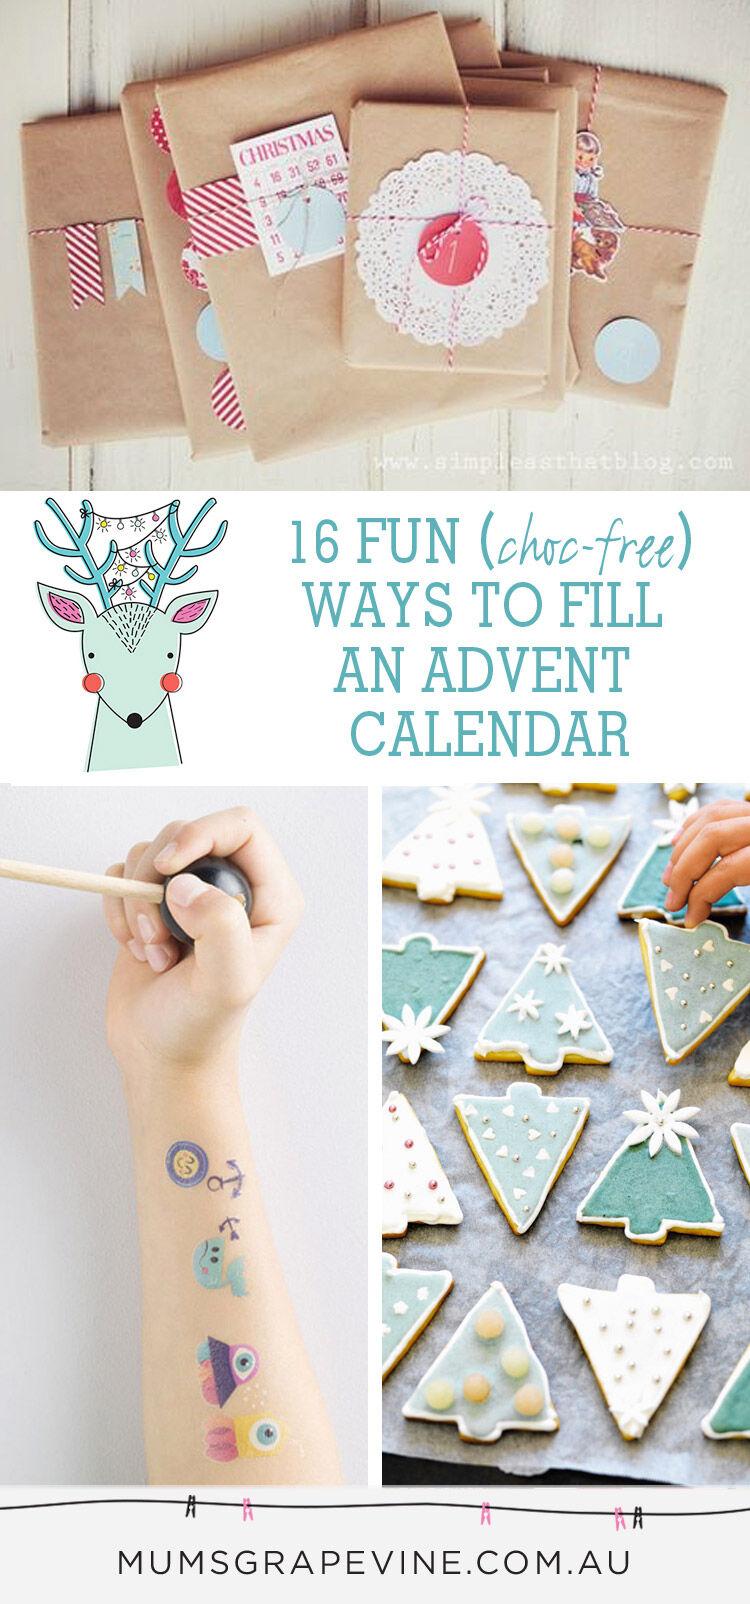 Choc free avent calendar filling ideas